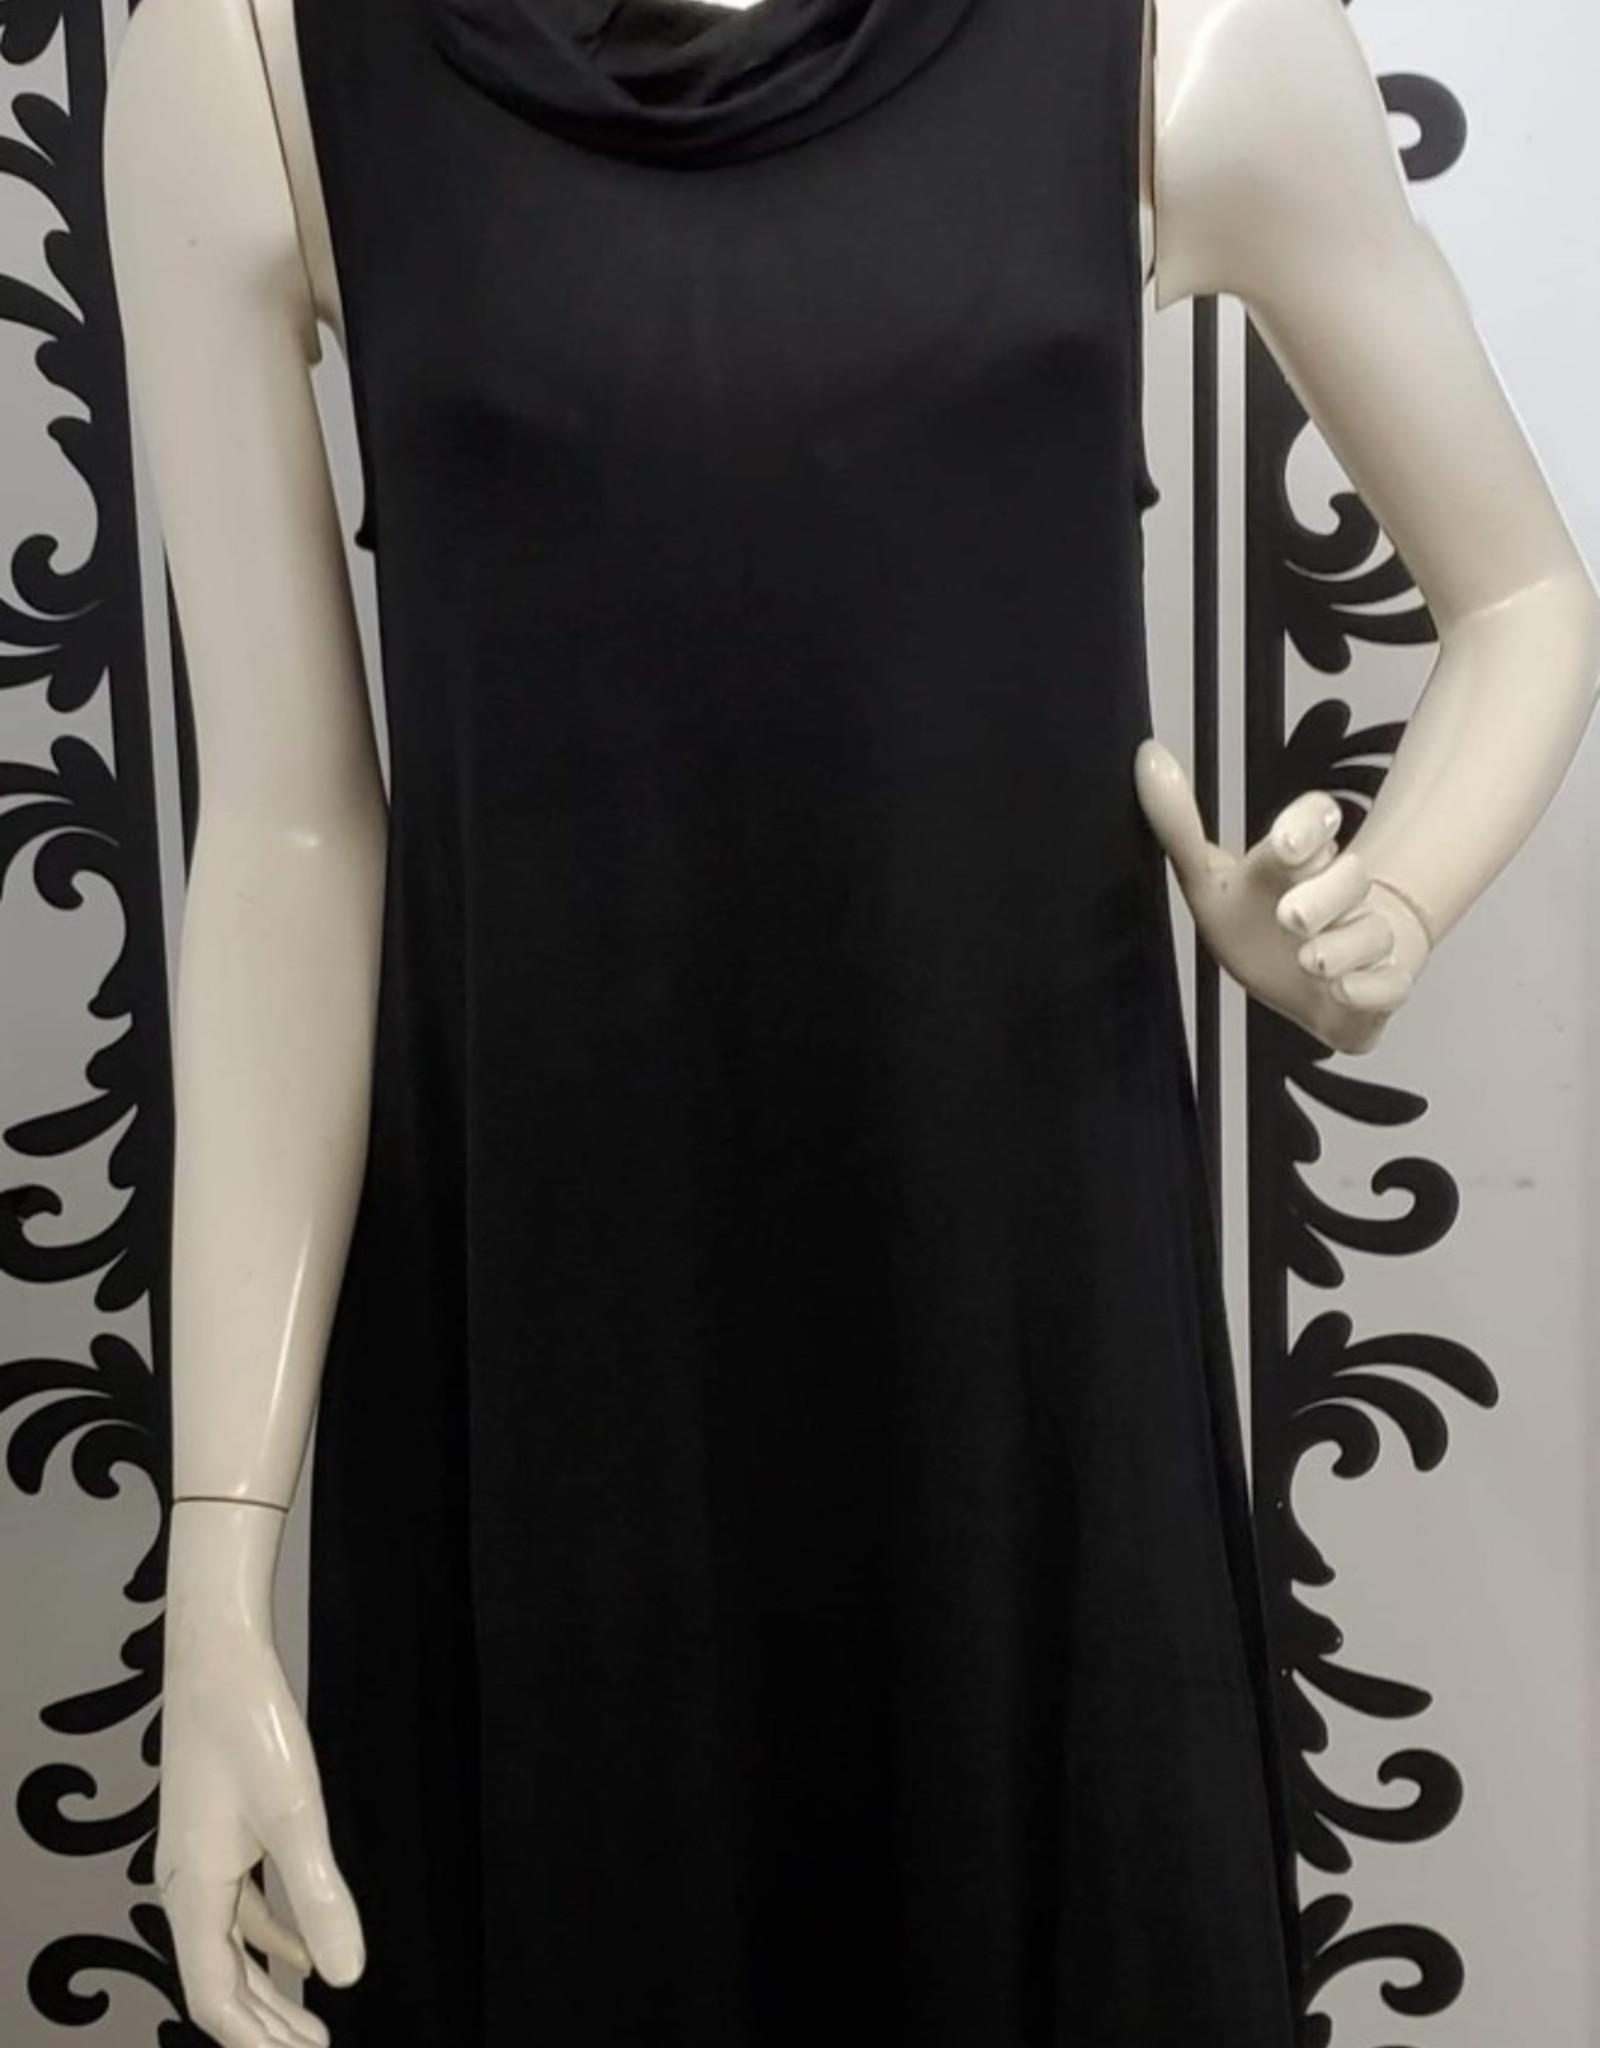 Keren Hart Cowl Neck Black Dress 48029